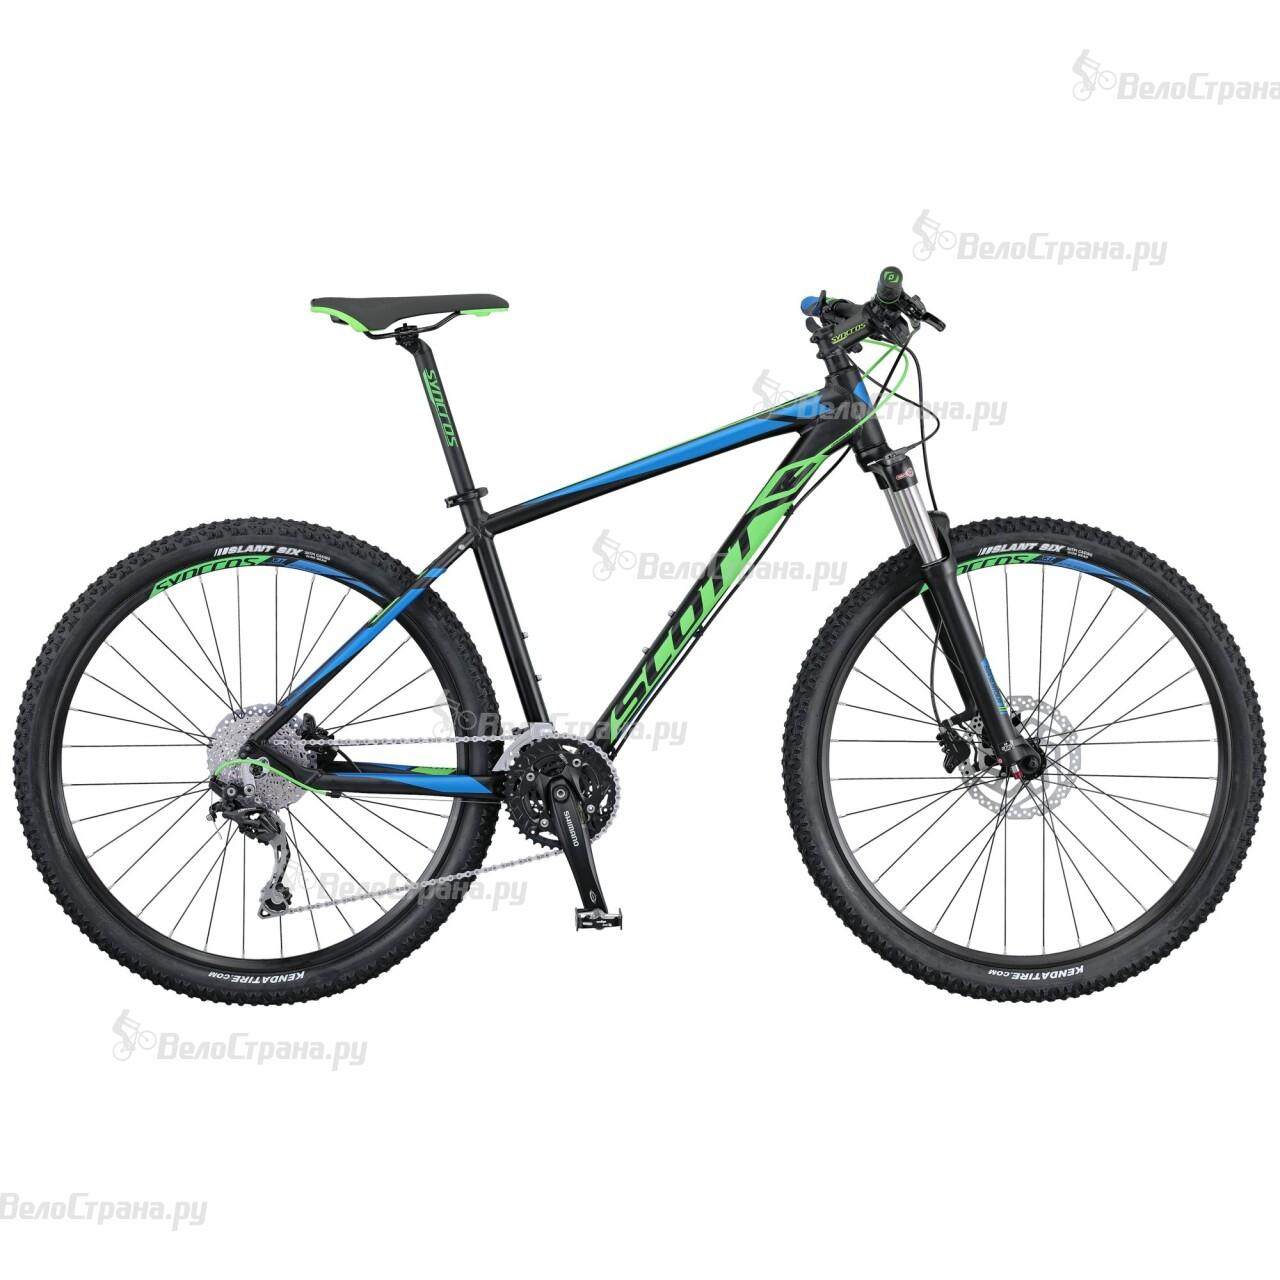 Велосипед Scott Aspect 920 (2016) велосипед scott aspect 920 29 2016